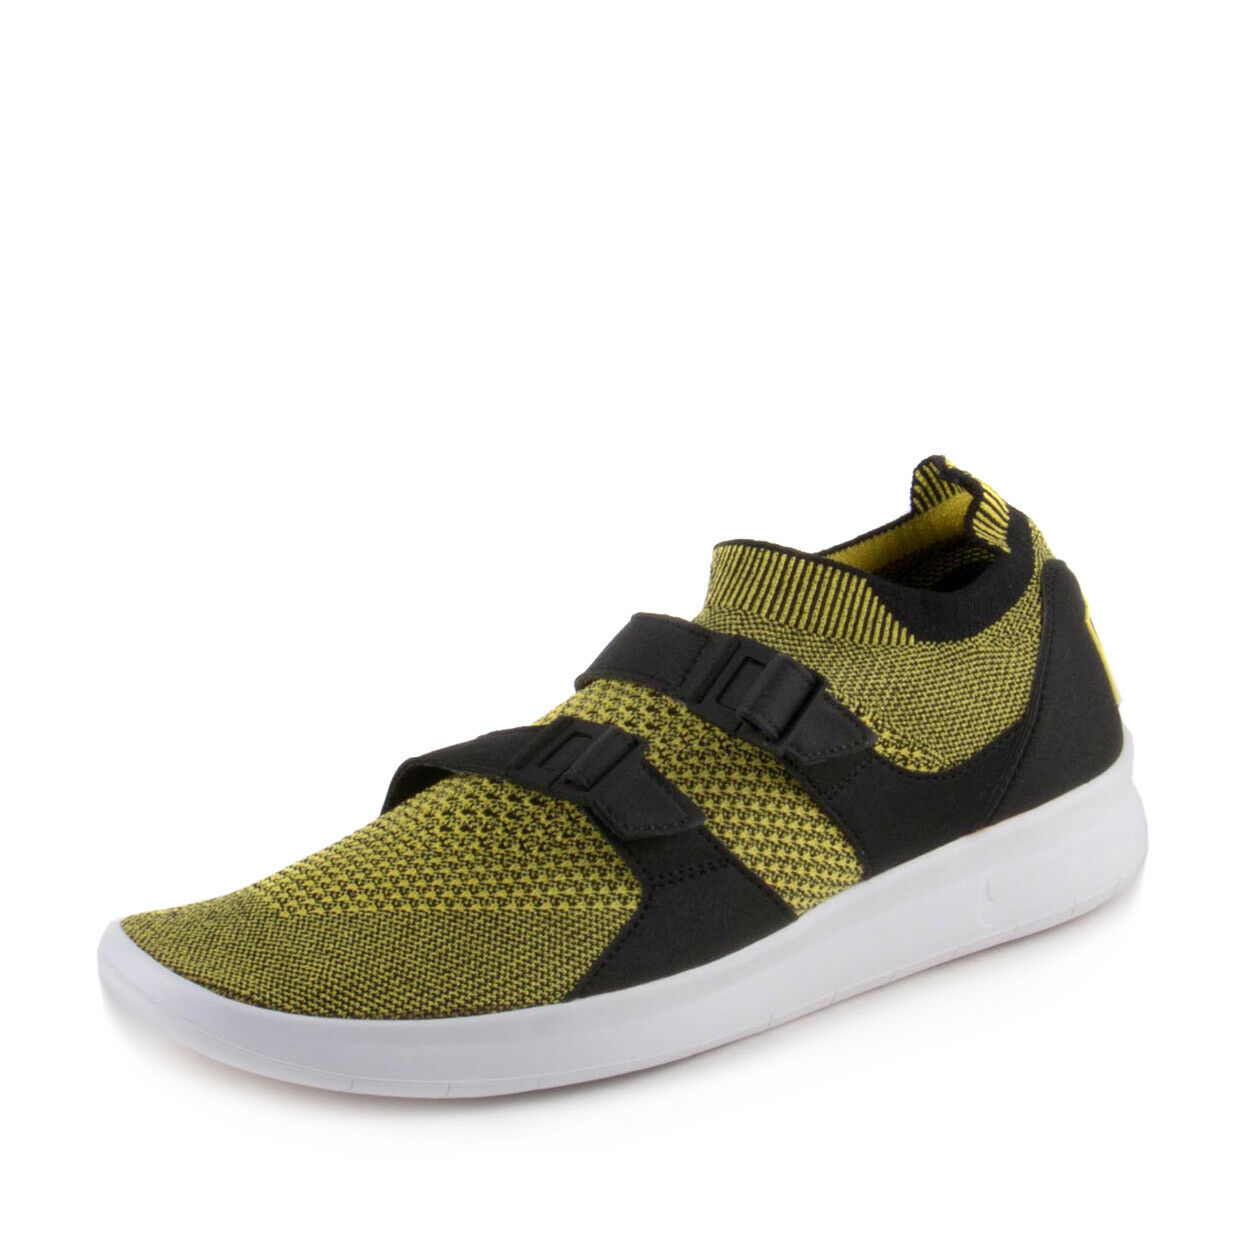 Nike air sockracer flyknit giallo sciopero 898022-700 Uomo